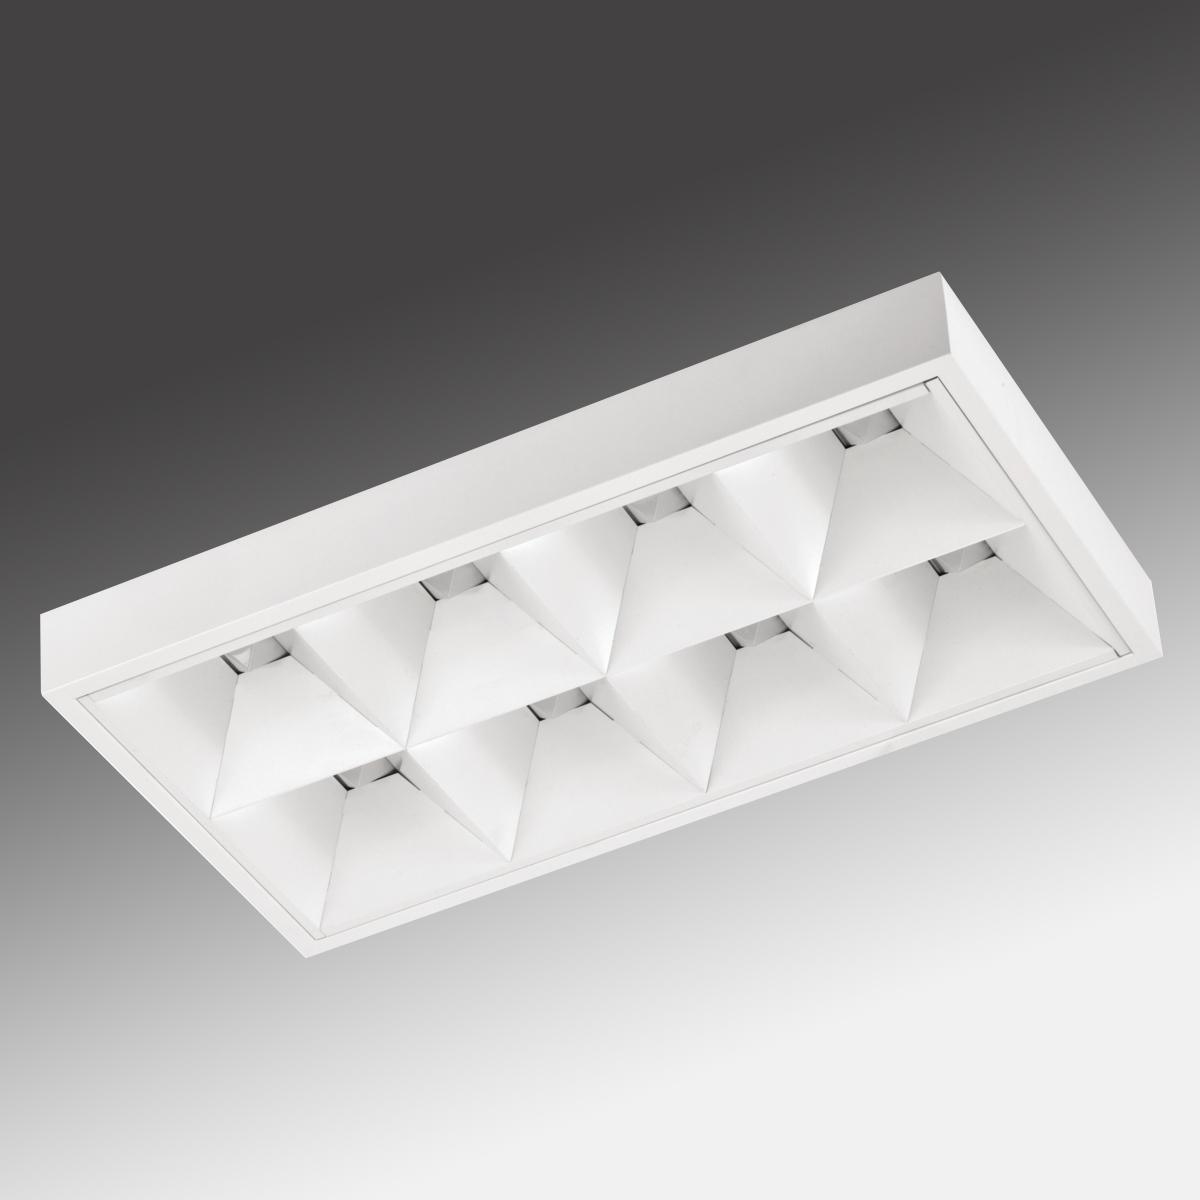 SALENA LED 39W 4050lm/840 SLB EVG IP20 weiß